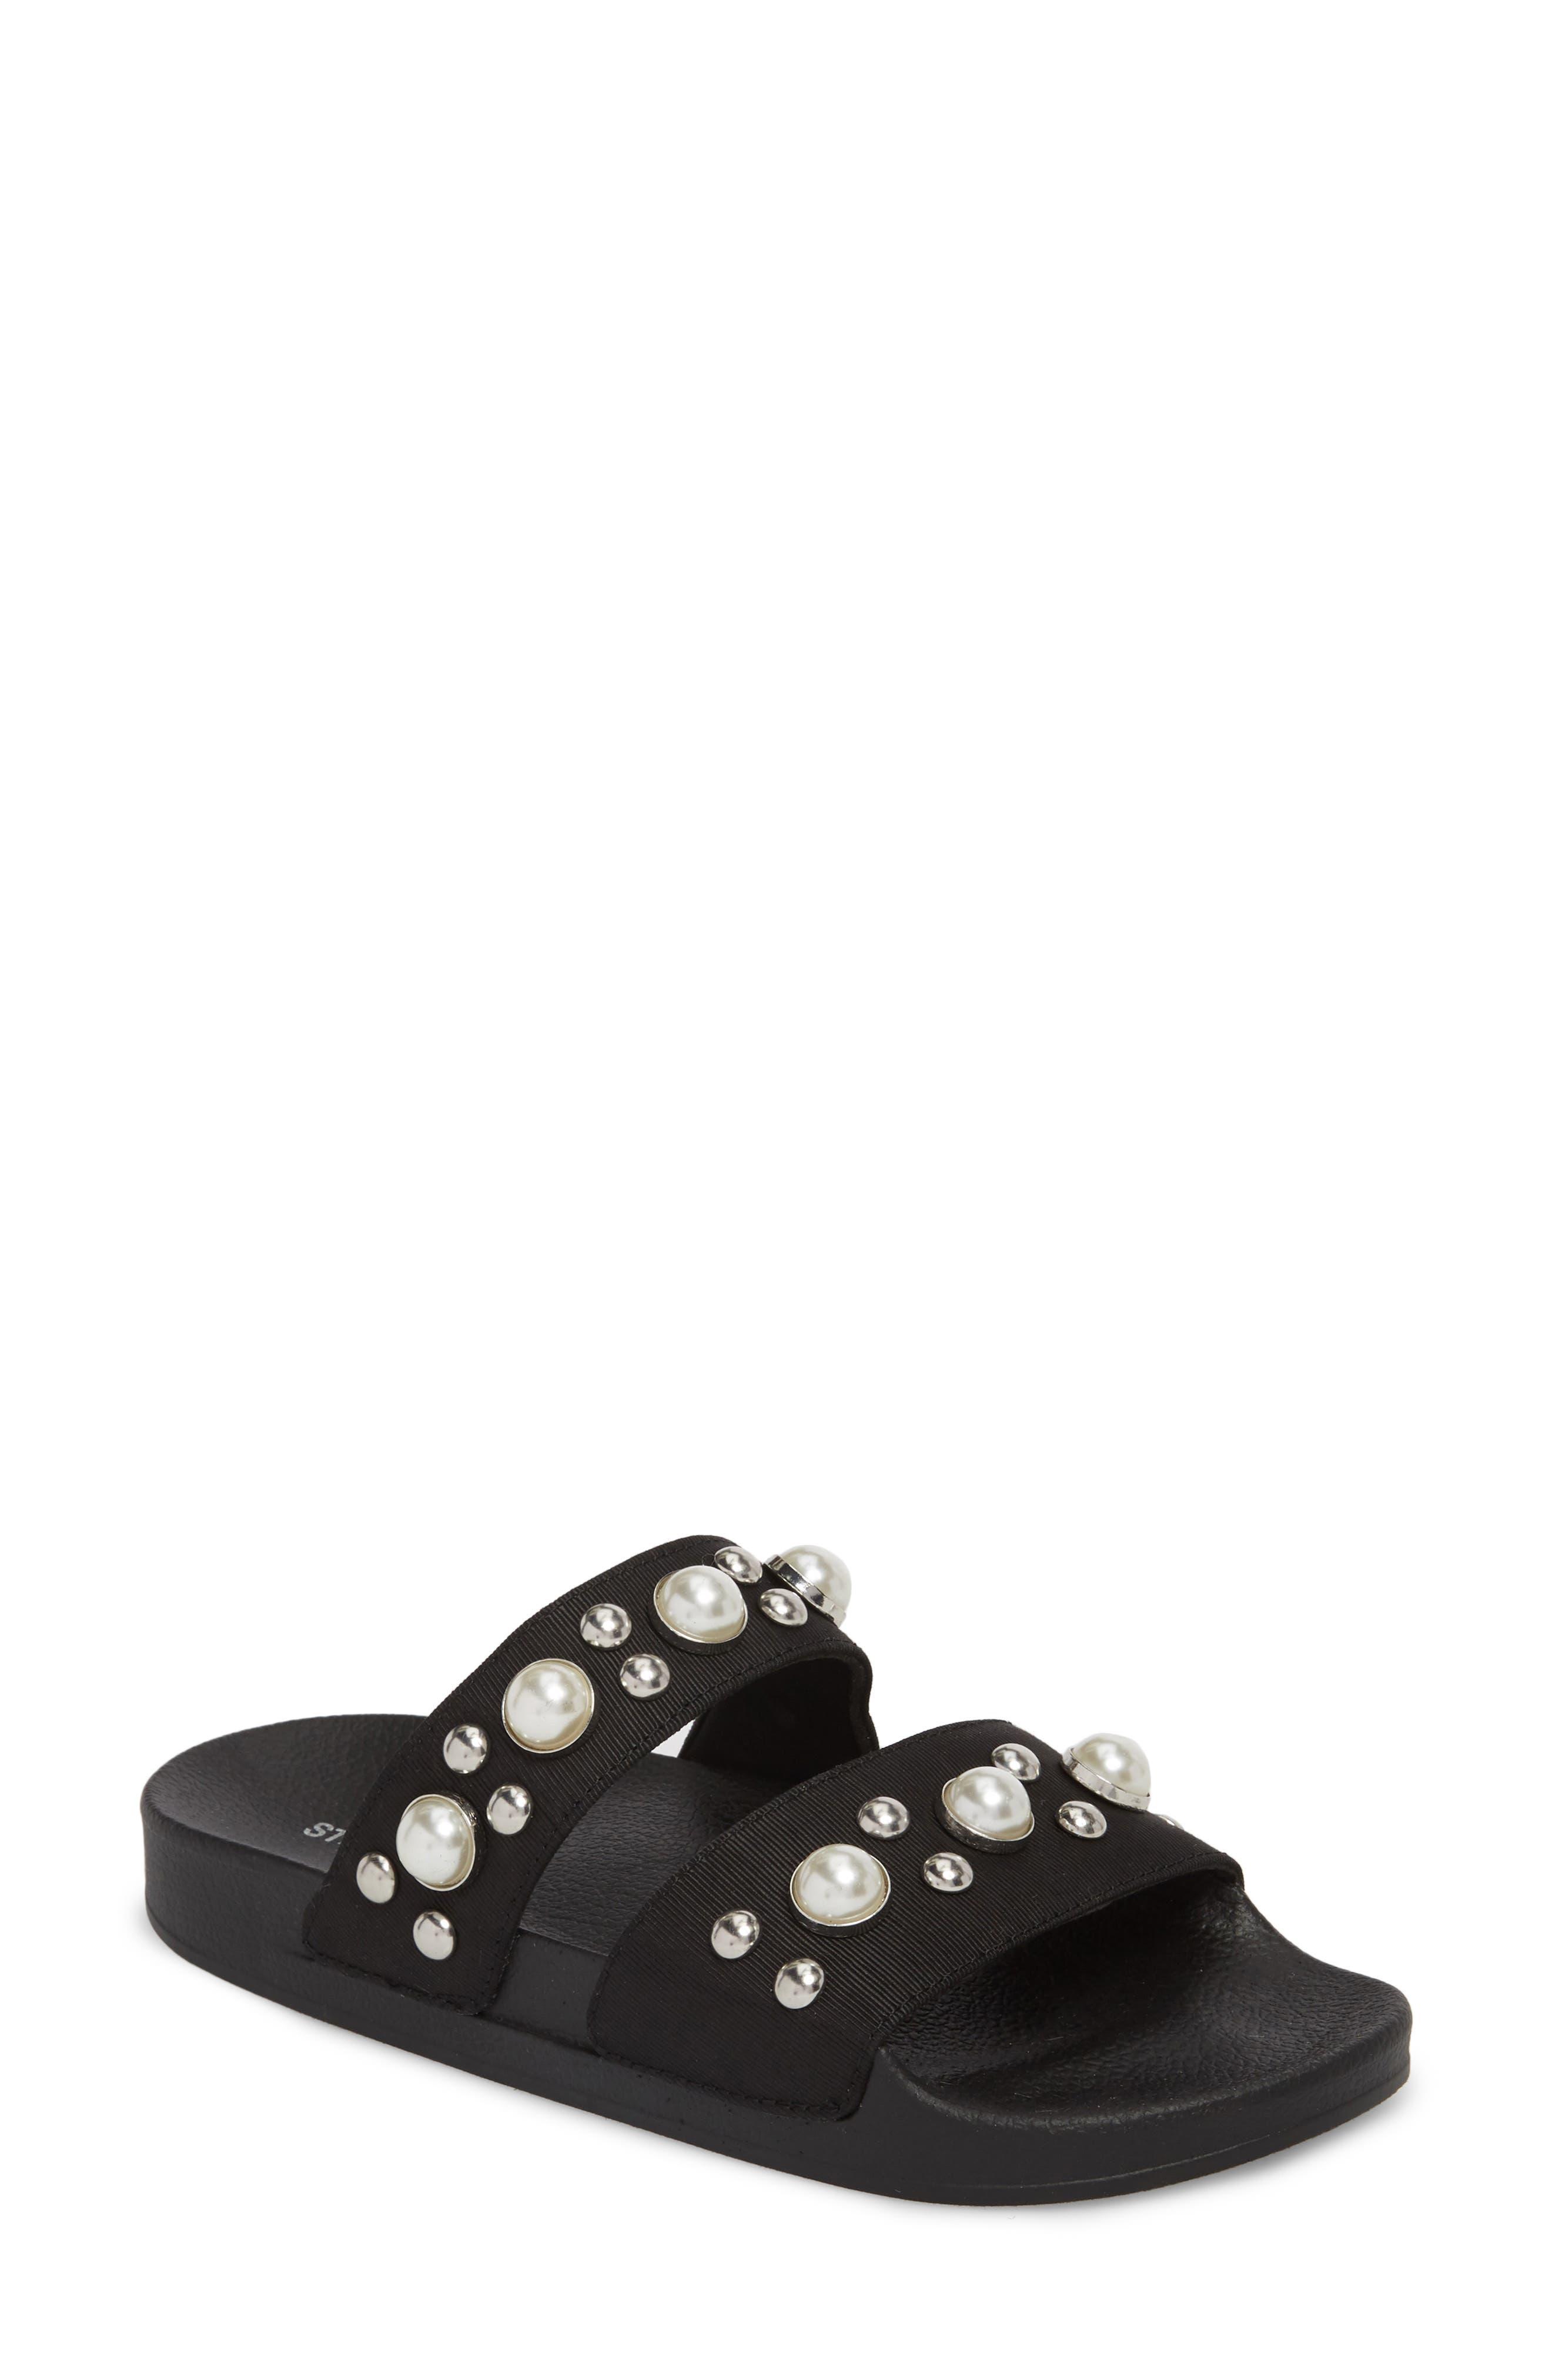 Steve Madden Polite Embellished Slide Sandal (Women)